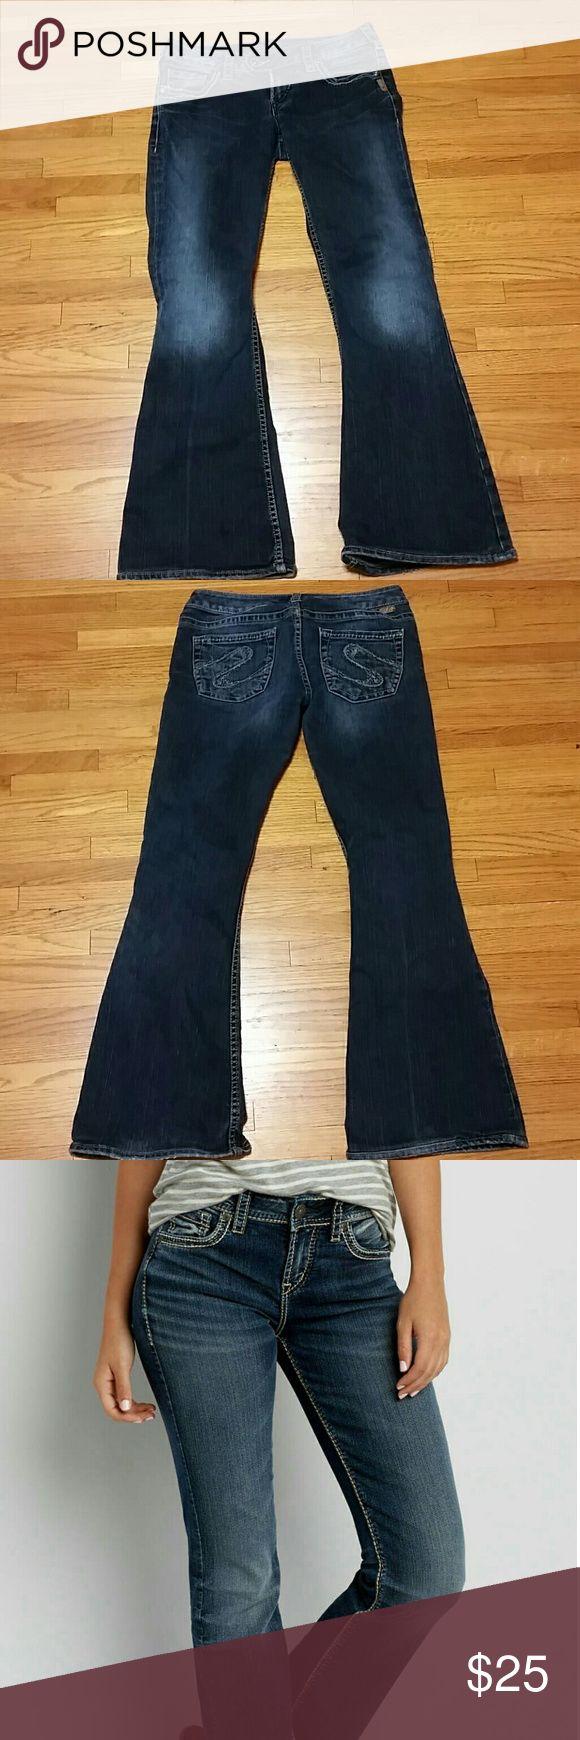 1000  ideas about Silver Jeans on Pinterest  Low cut jeans miss